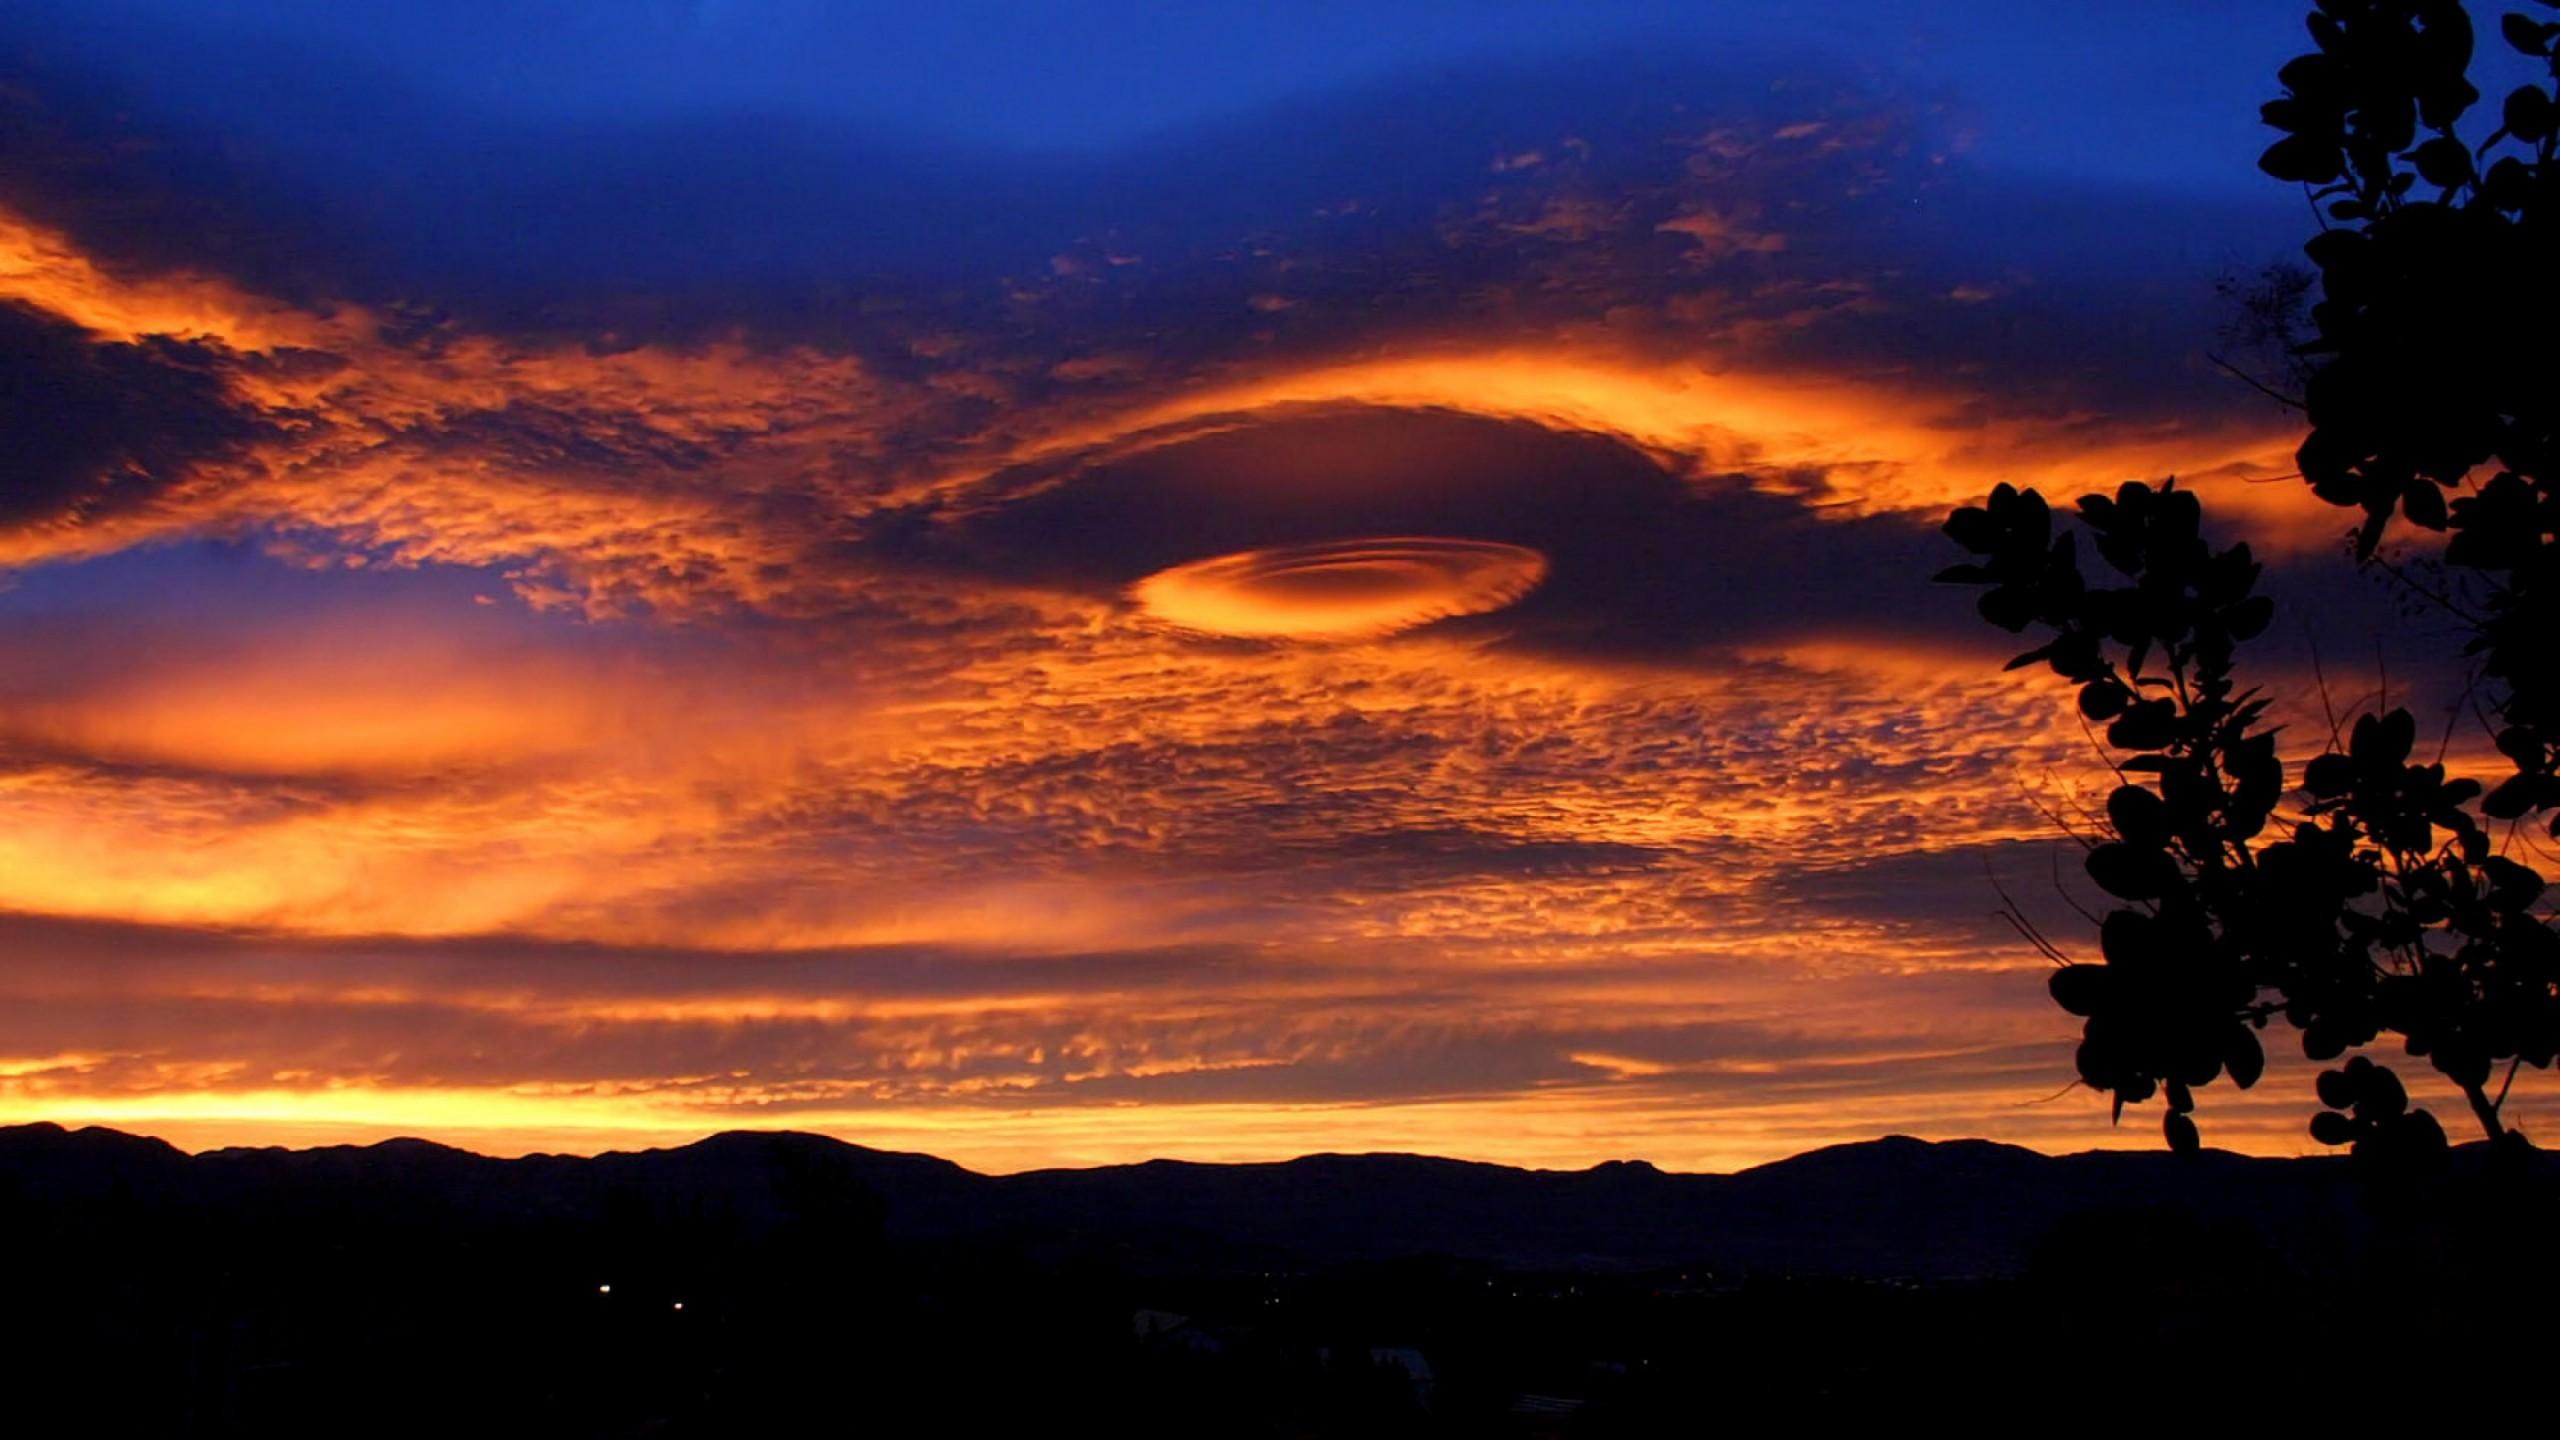 sunset_in_reno_wallpaper_2560x1440